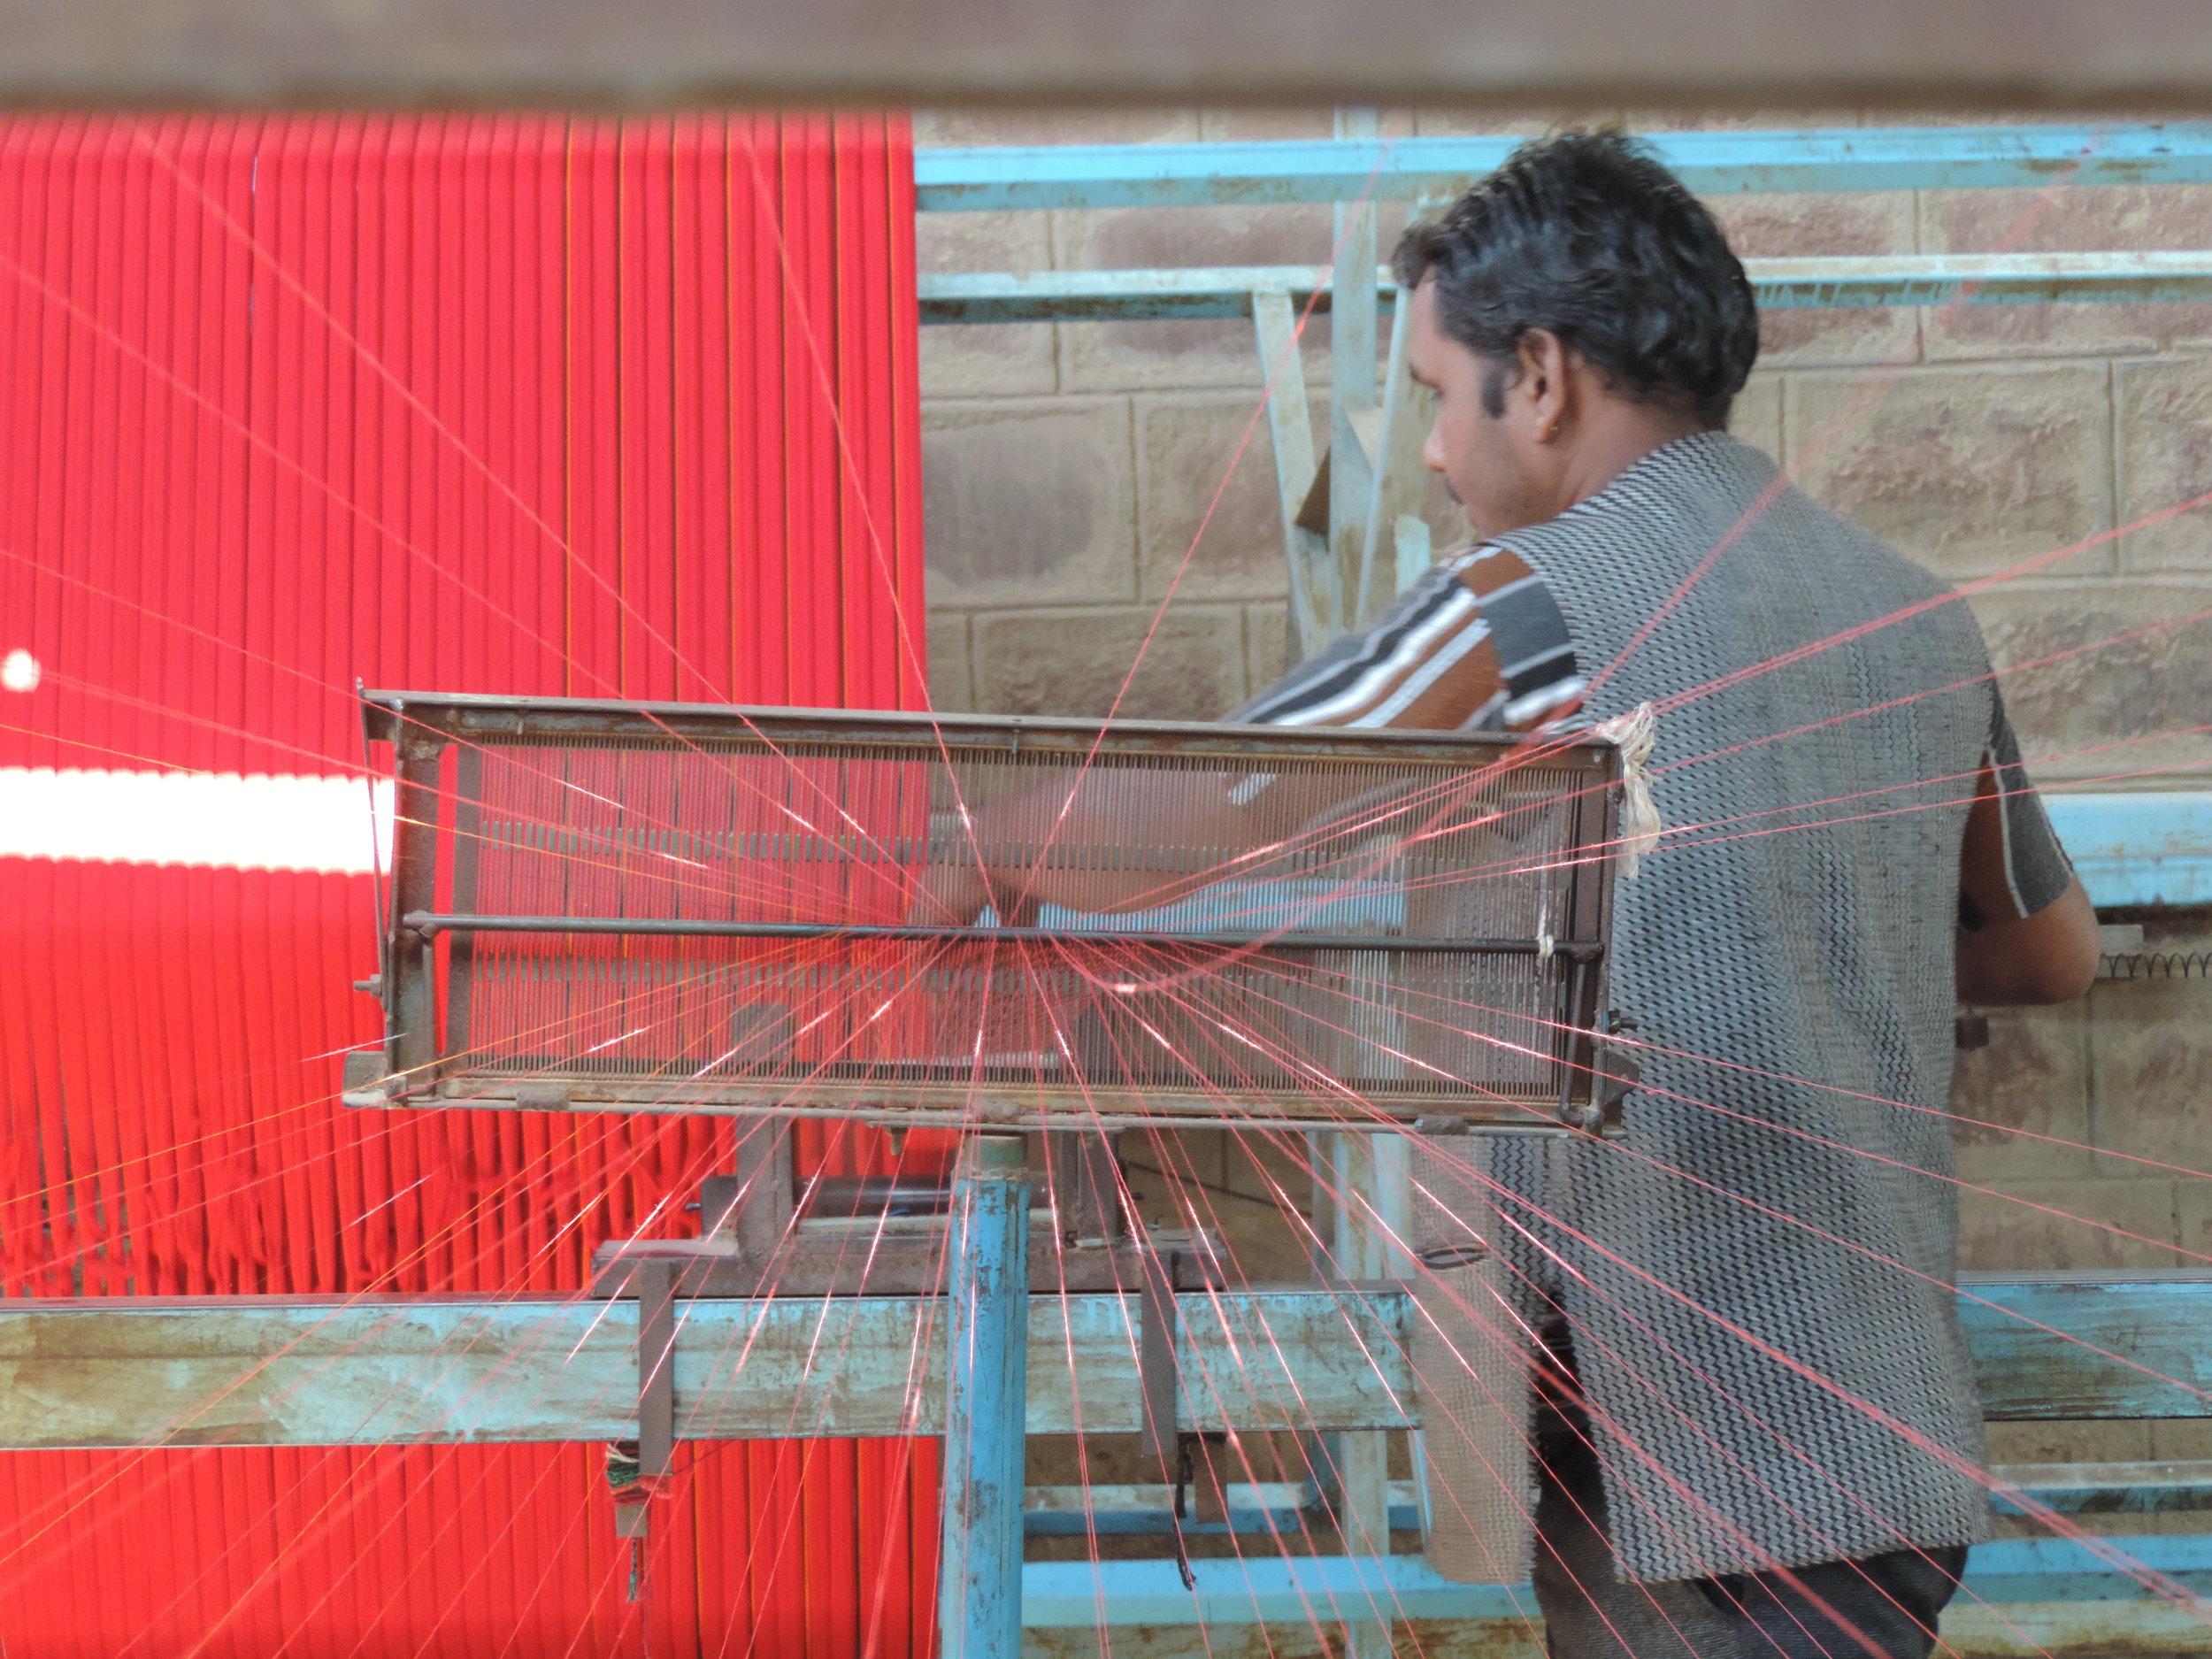 Spinning threads of Yarn